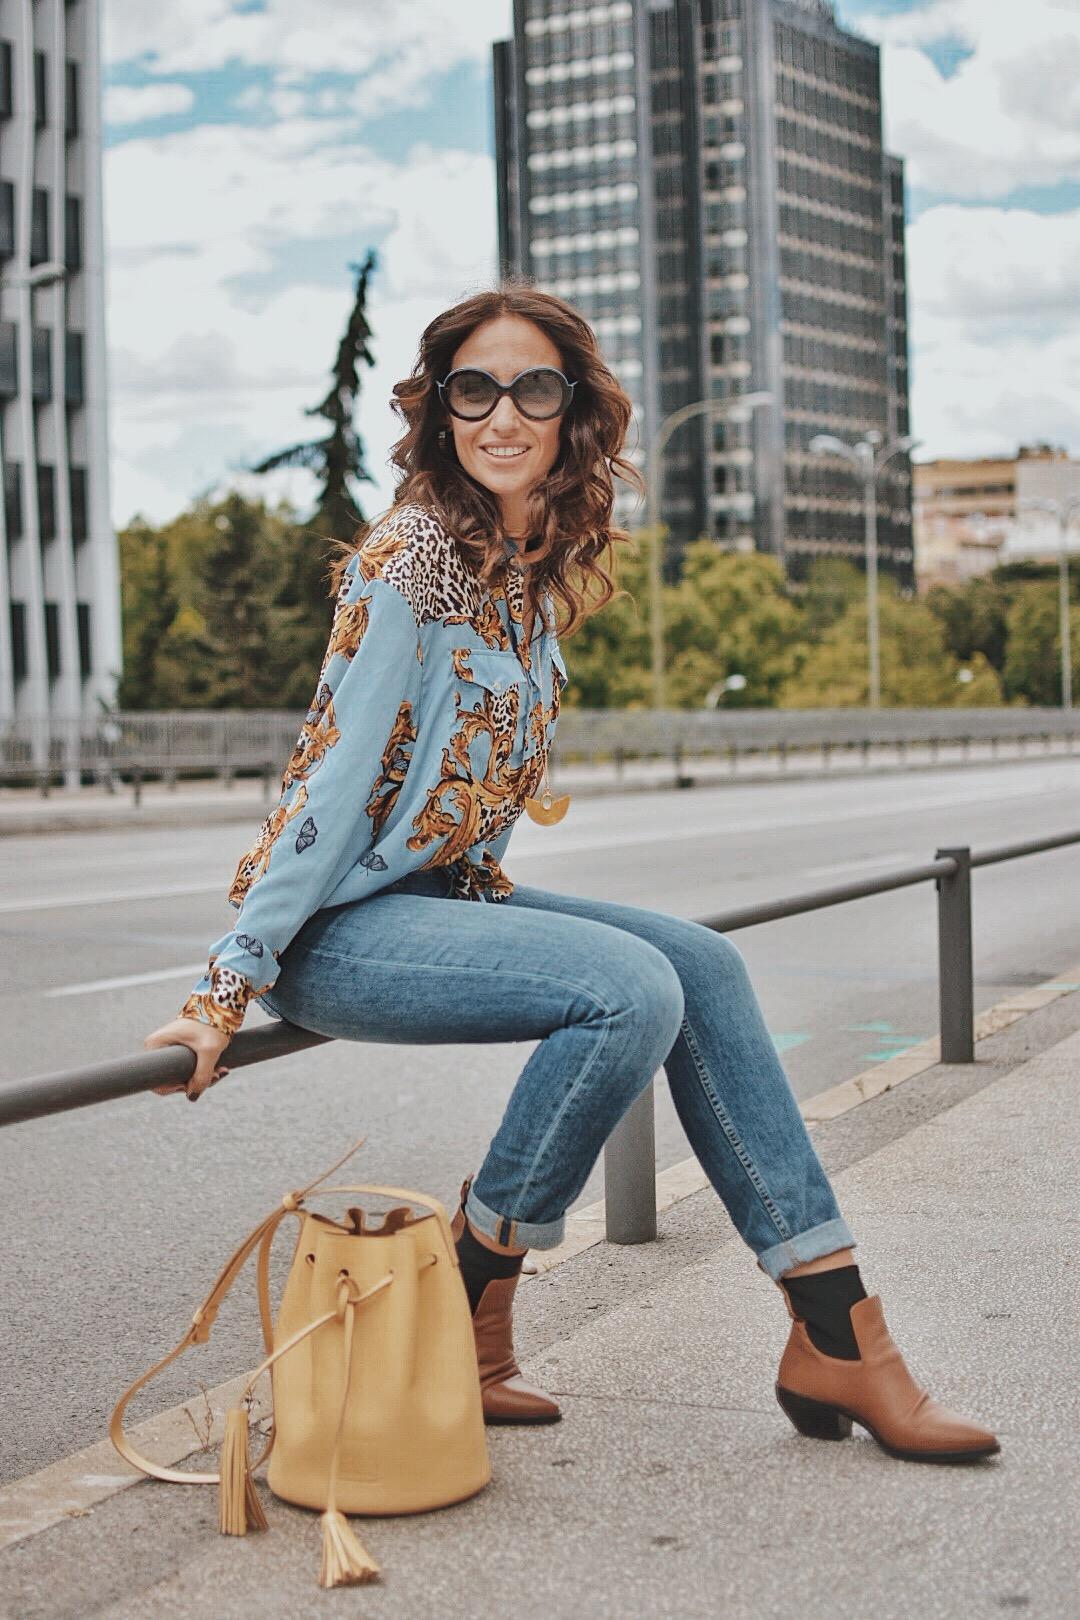 el-blog-de-silvia-look-casual-vaqueros-jeans